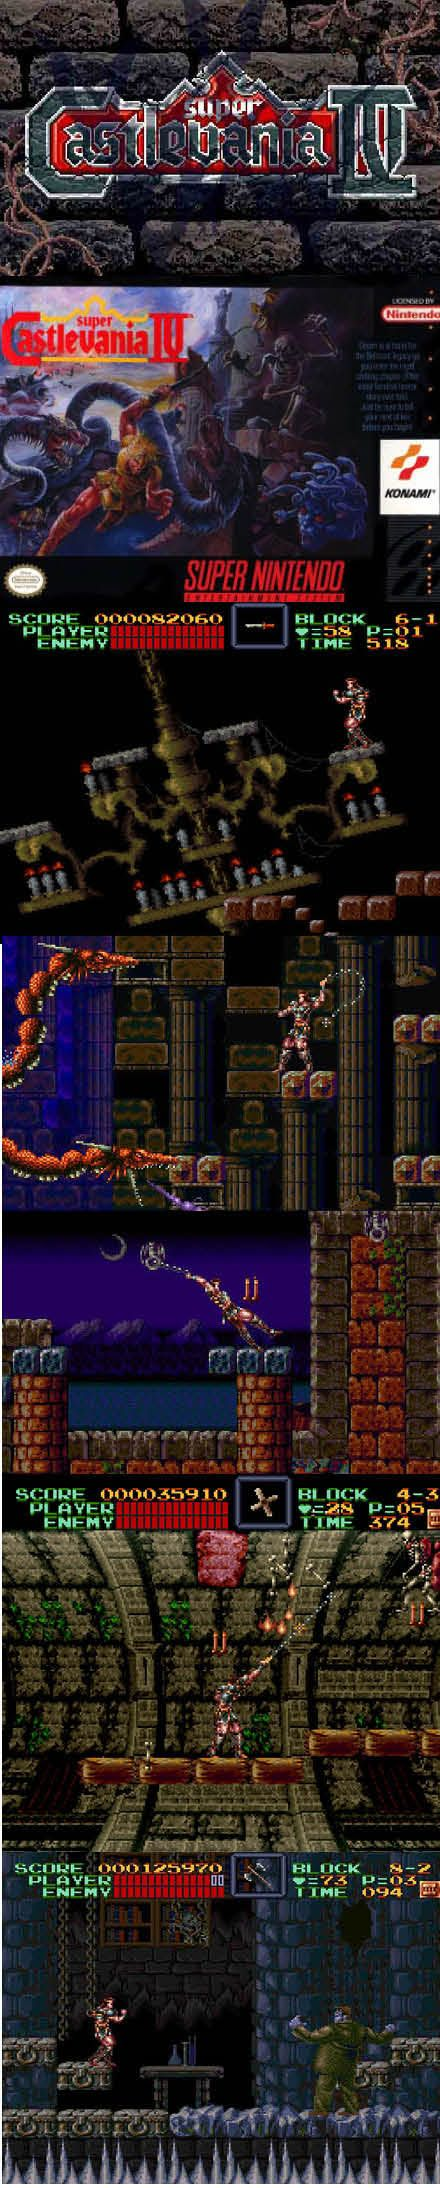 #RetroGamer #SuperCastlevania IV still a great reason to buy a #SNES or a newer #Nintendo system! http://www.levelgamingground.com/super-castlevanina-iv-review.html